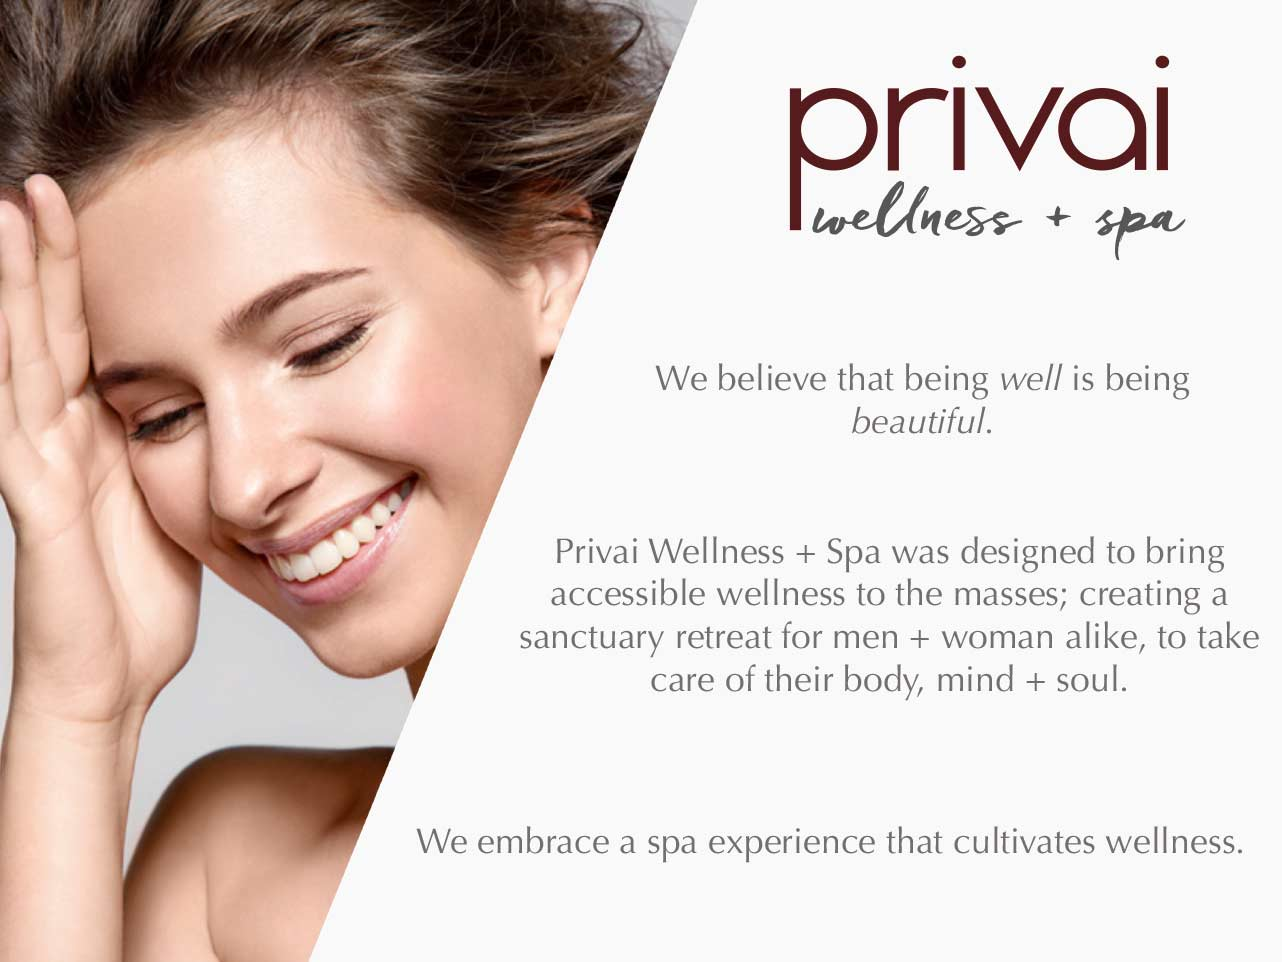 privai-wellness-ad